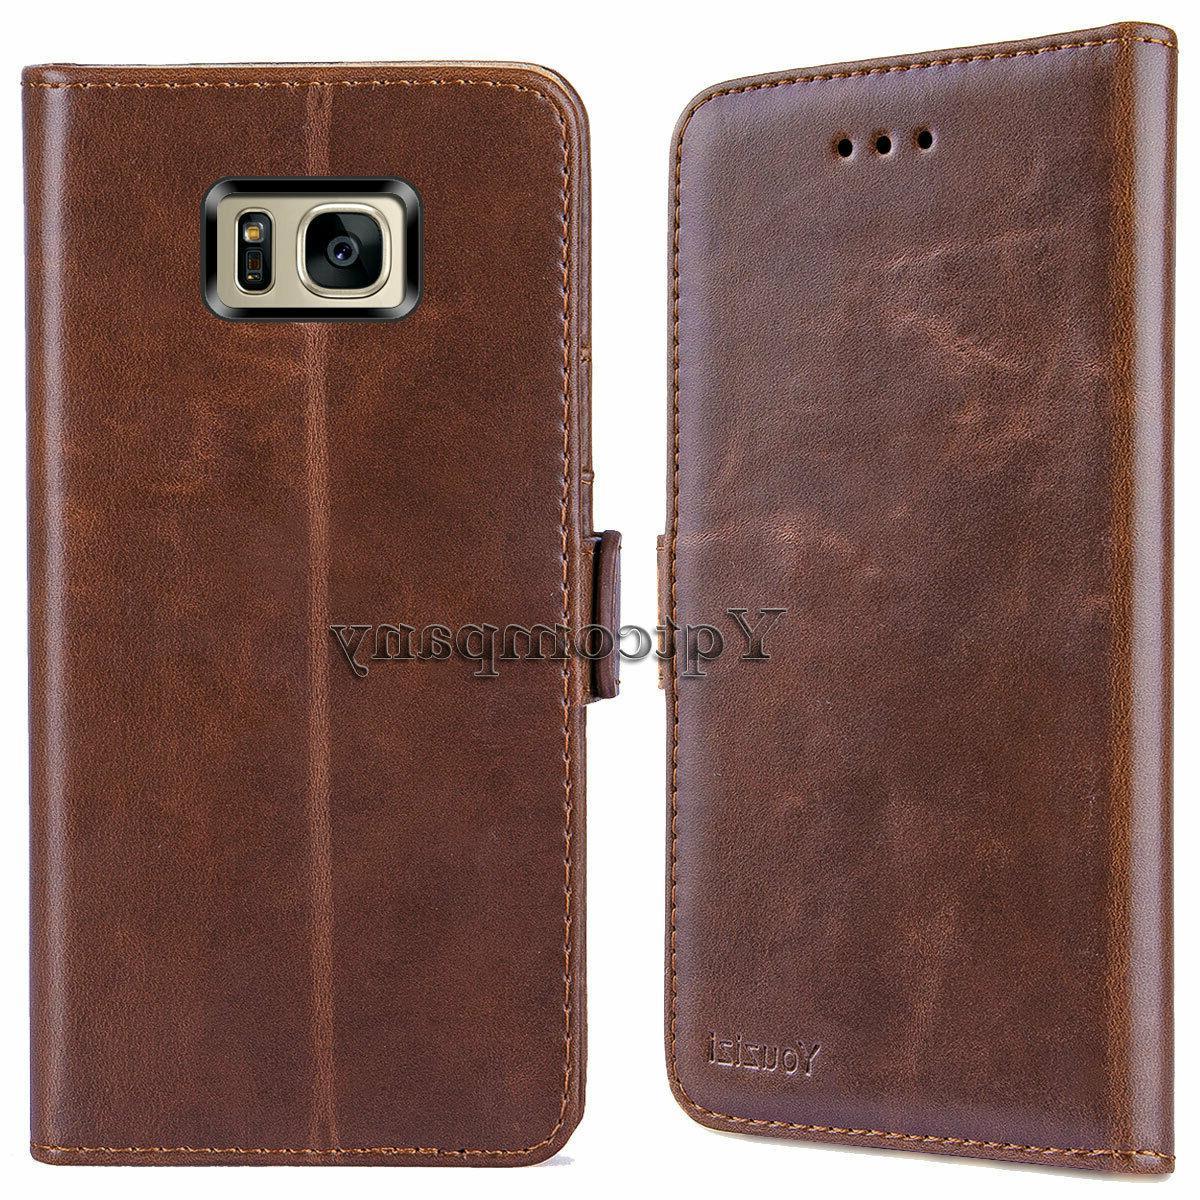 For Samsung Edge Phone Case Card